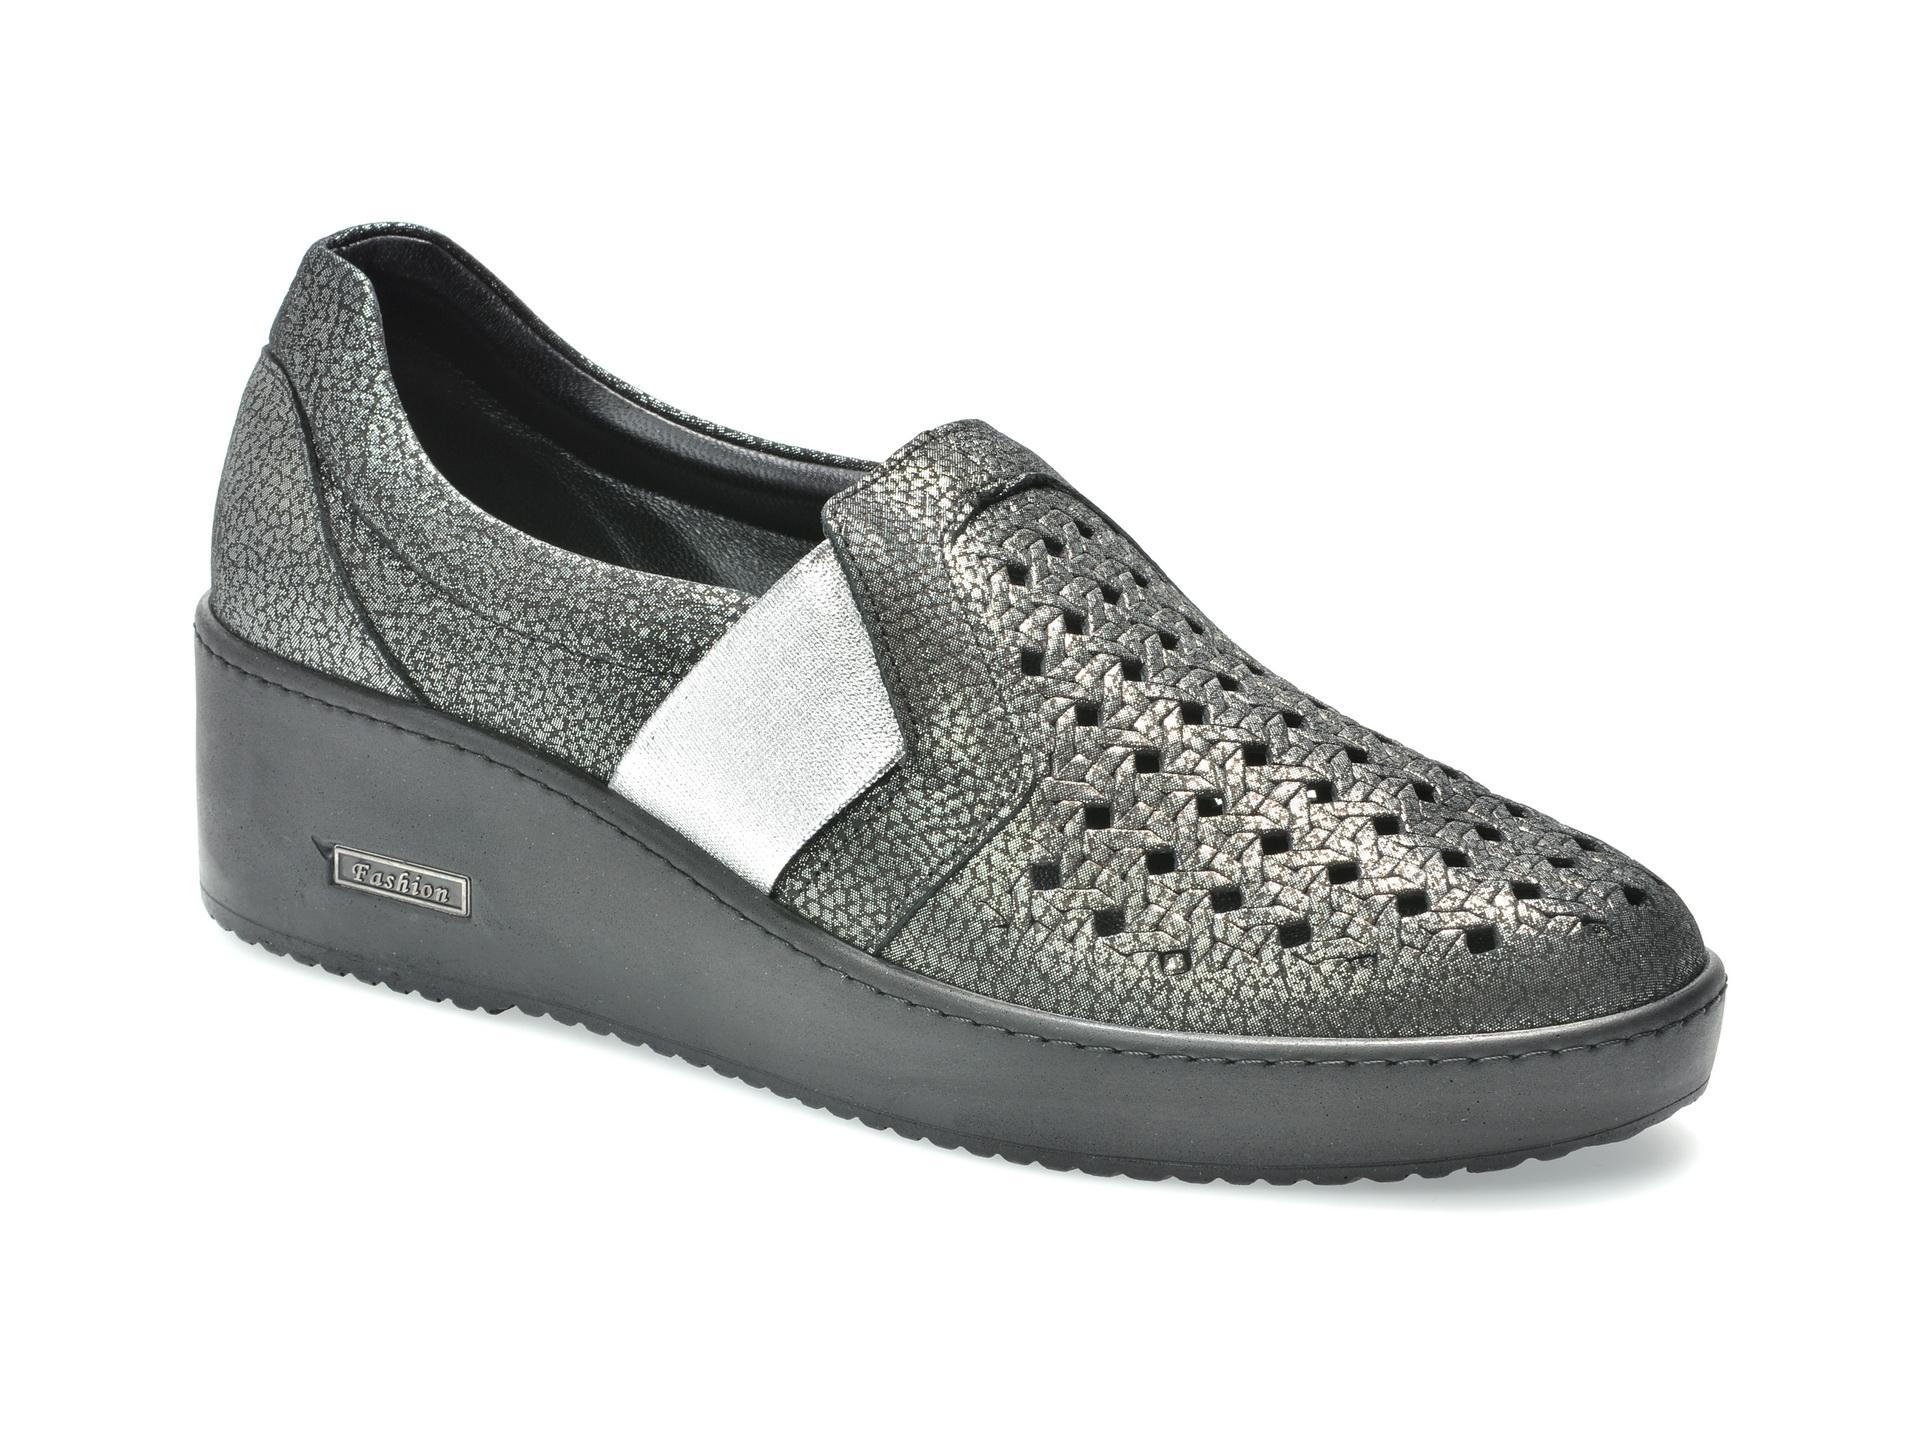 Pantofi FLAVIA PASSINI gri, 1583421, din piele naturala